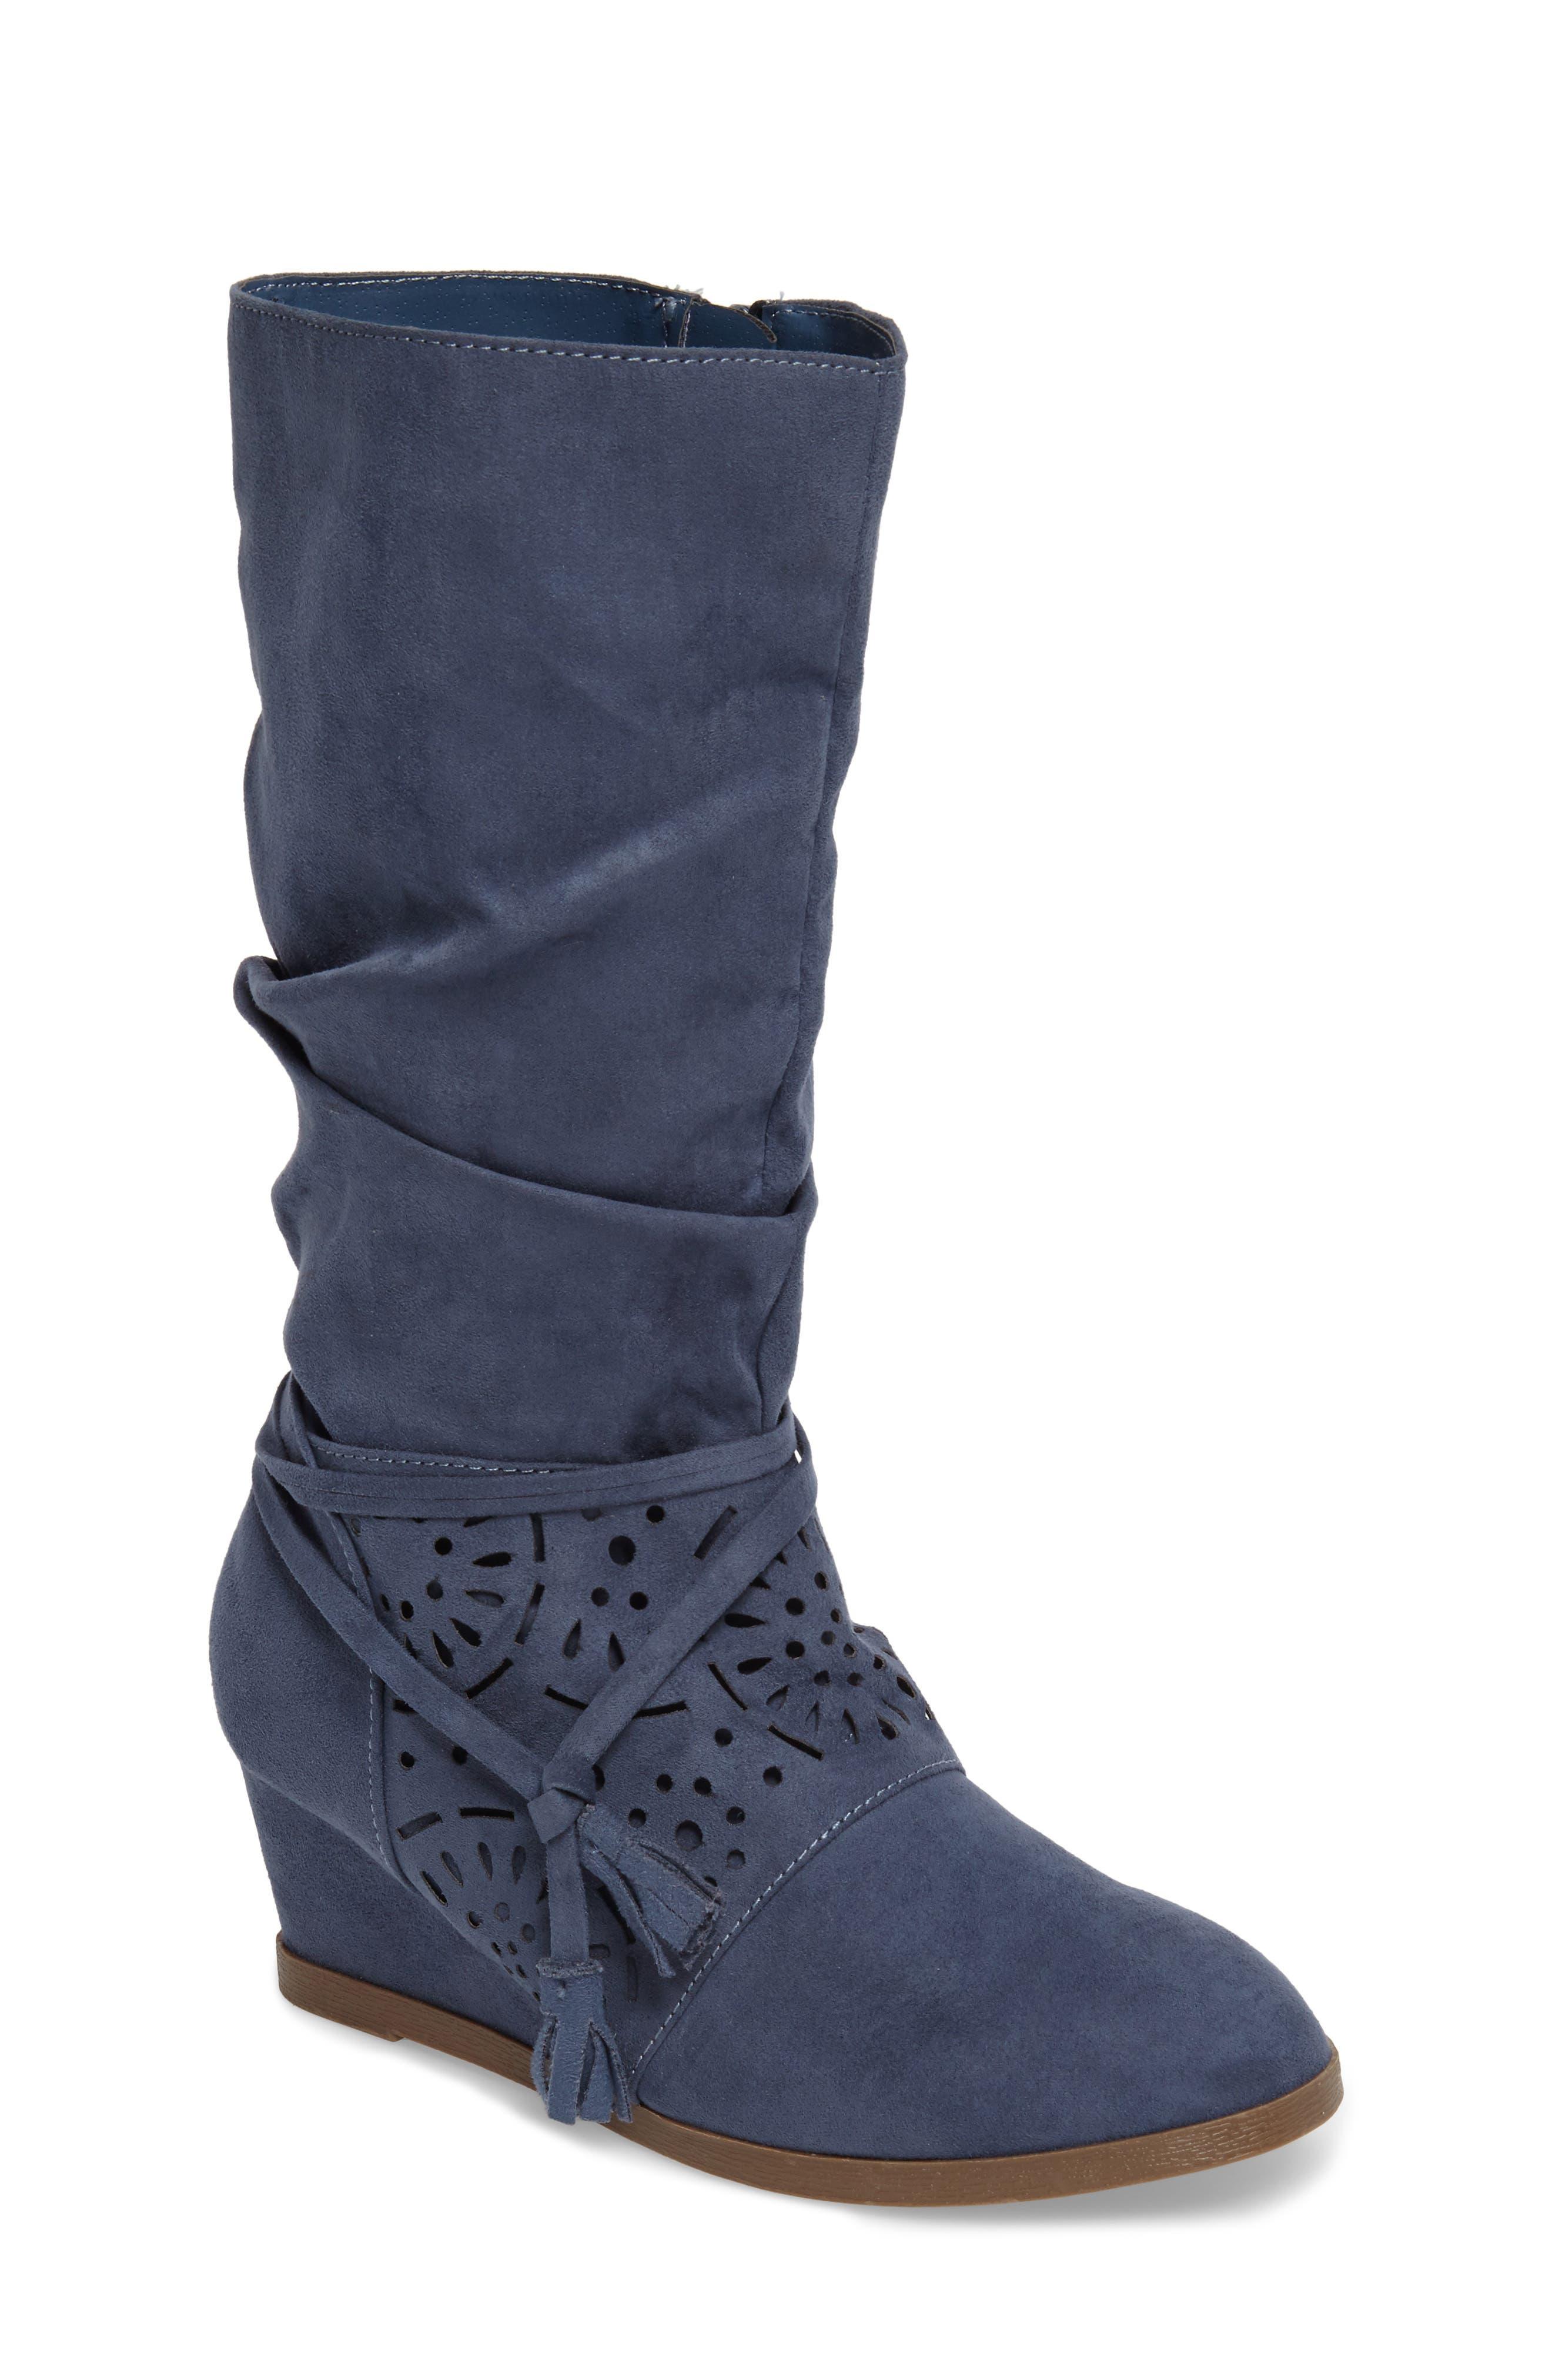 Jessica Simpson Monterey Slouchy Wedge Boot (Toddler, Little Kid & Big Kid)